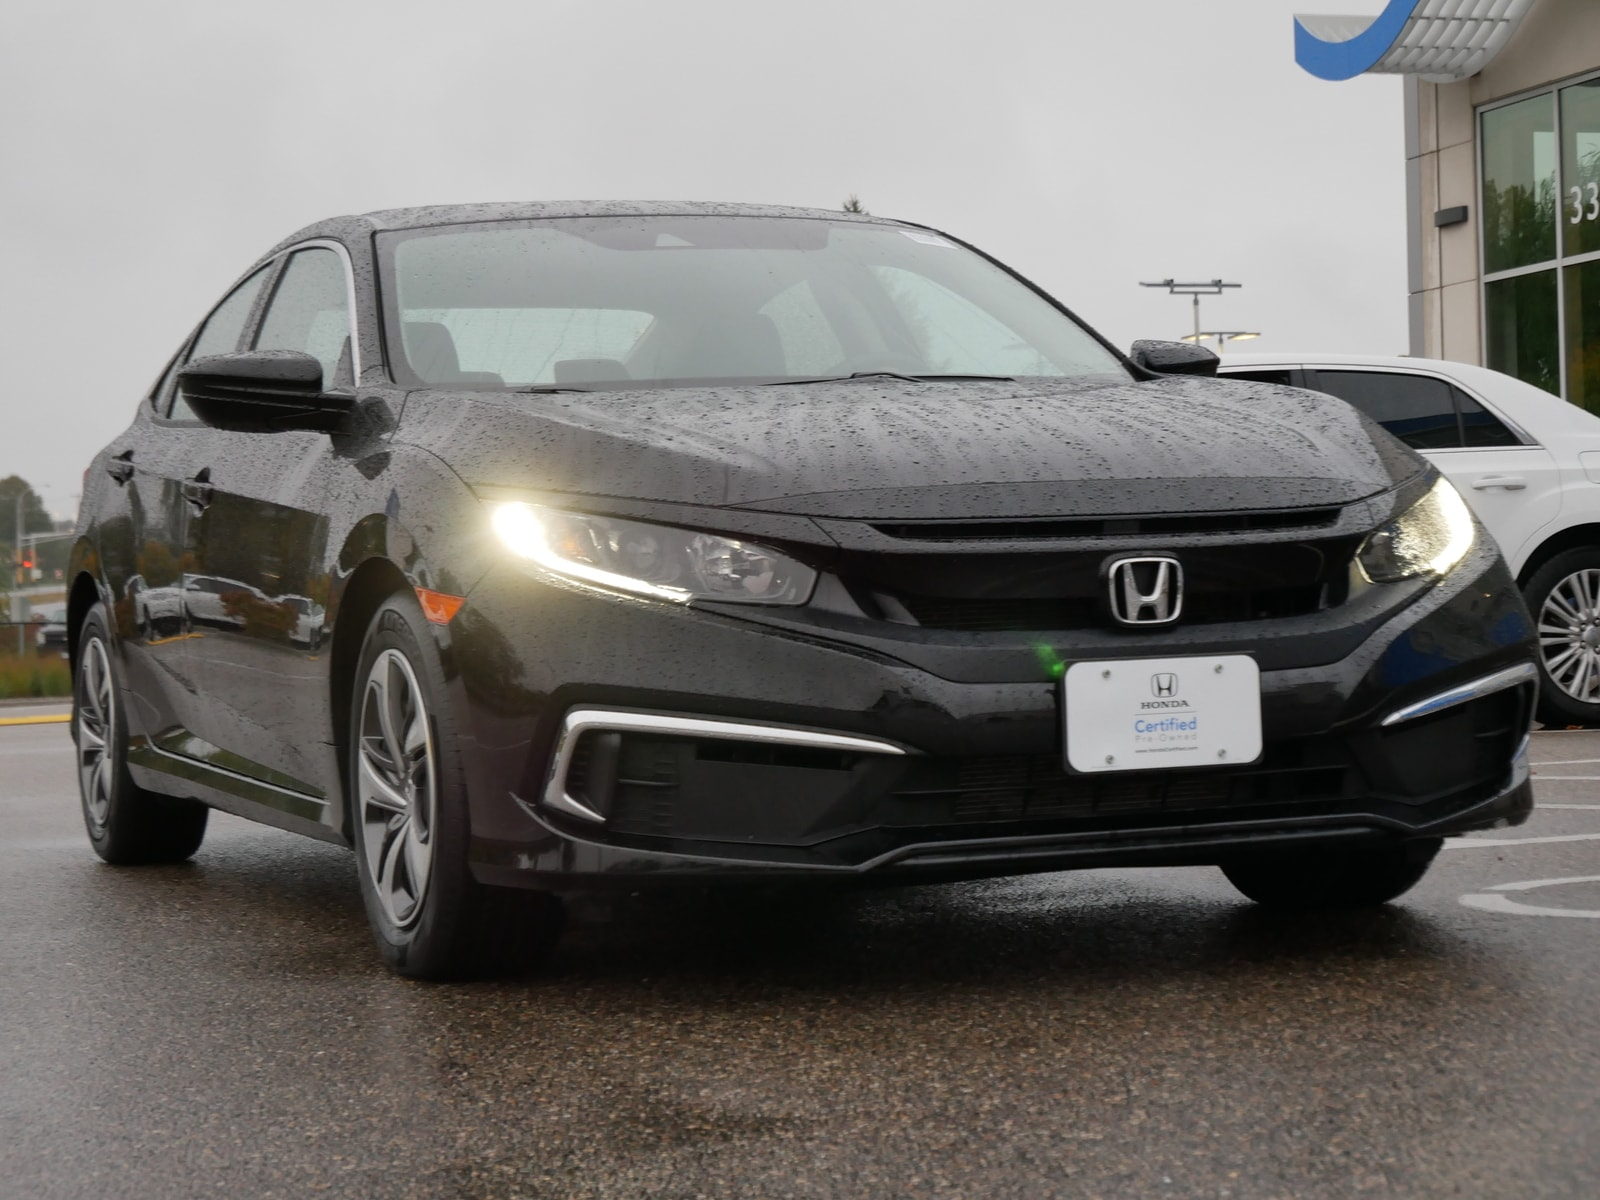 Certified 2019 Honda Civic LX with VIN 19XFC2F61KE011849 for sale in Saint Paul, Minnesota